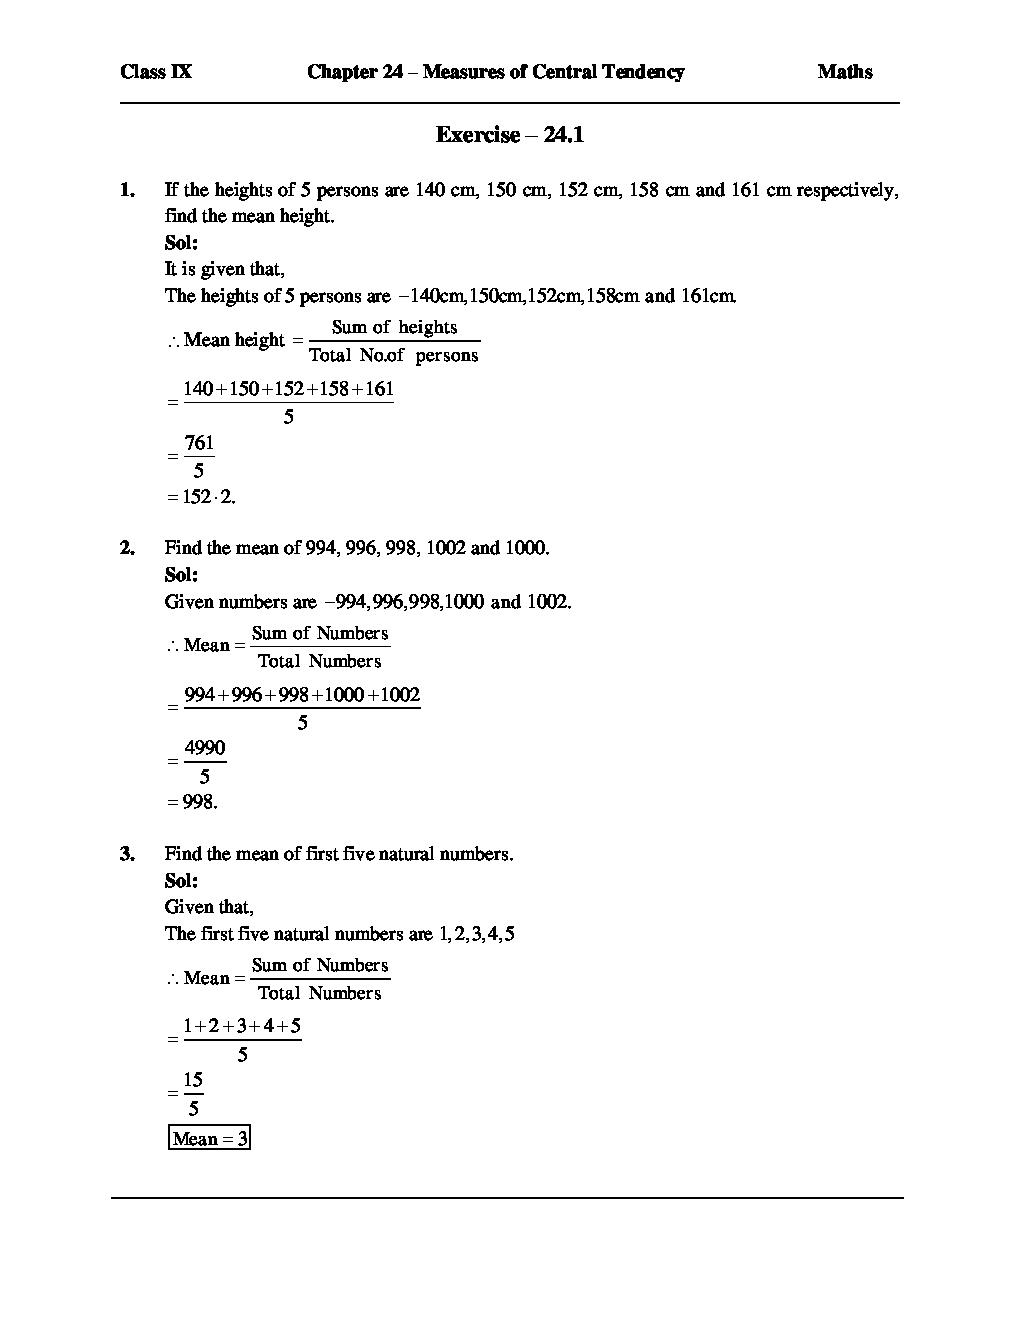 Class download rd 9 ebook sharma mathematics